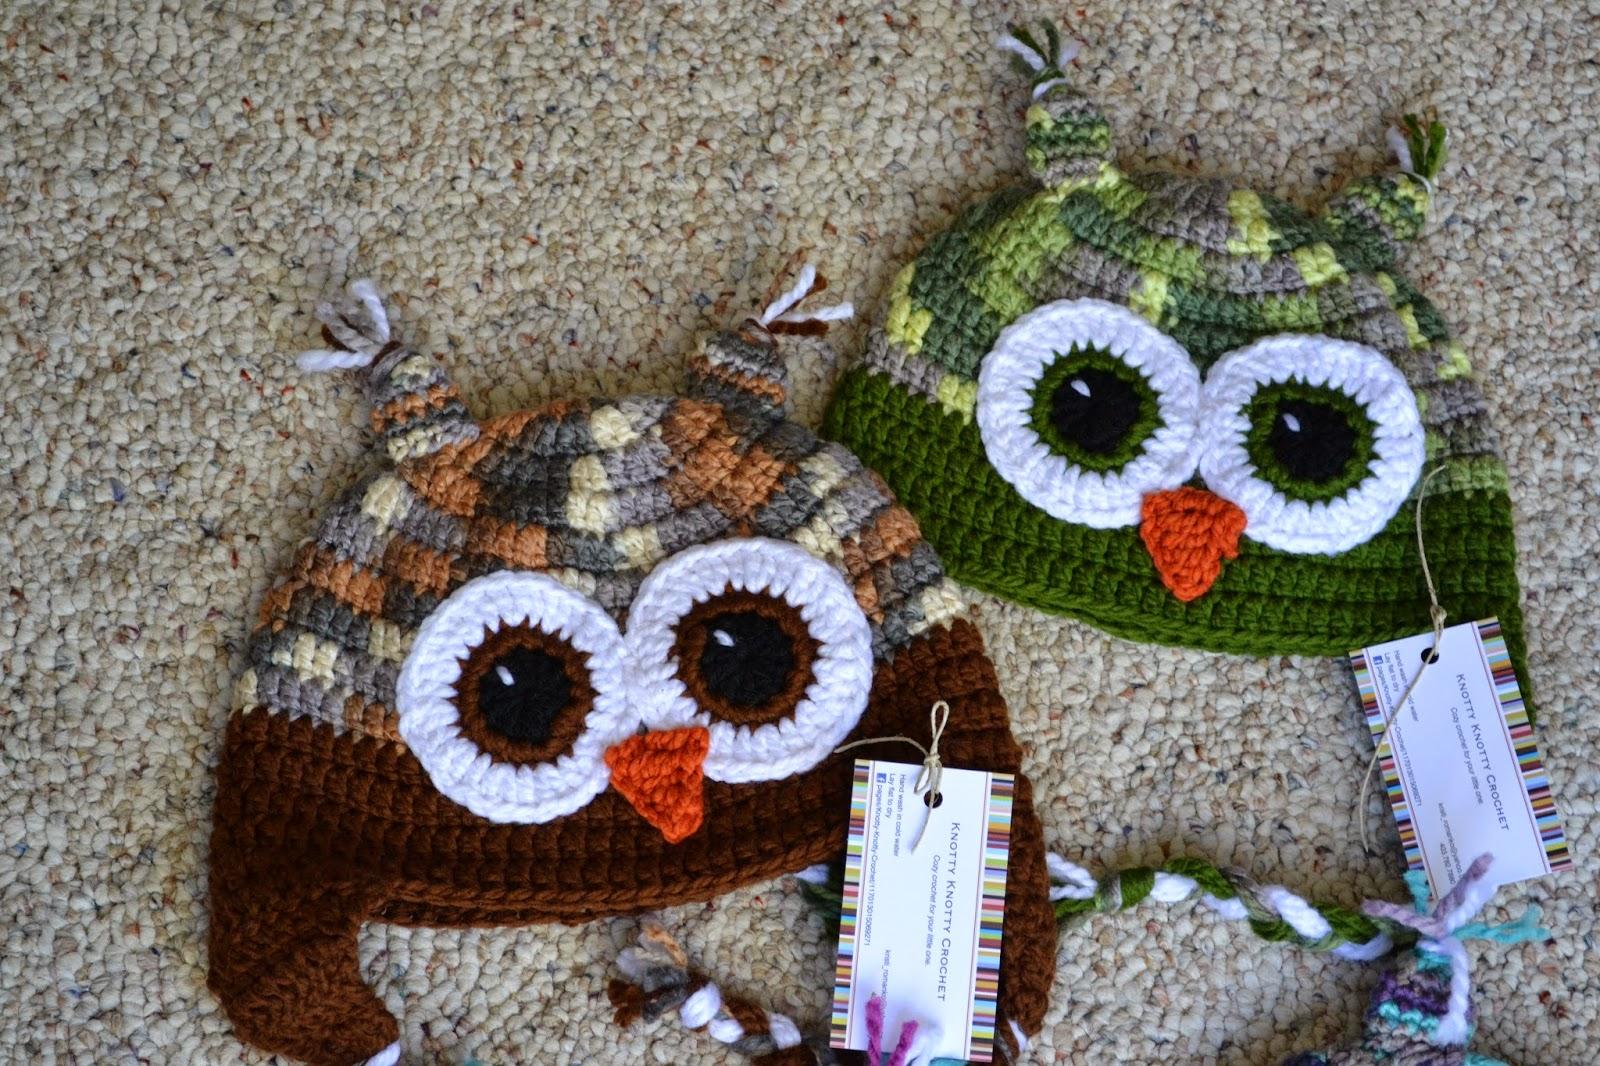 Knotty knotty crochet hoot hoot owl hat free pattern knotty knotty crochet bankloansurffo Choice Image